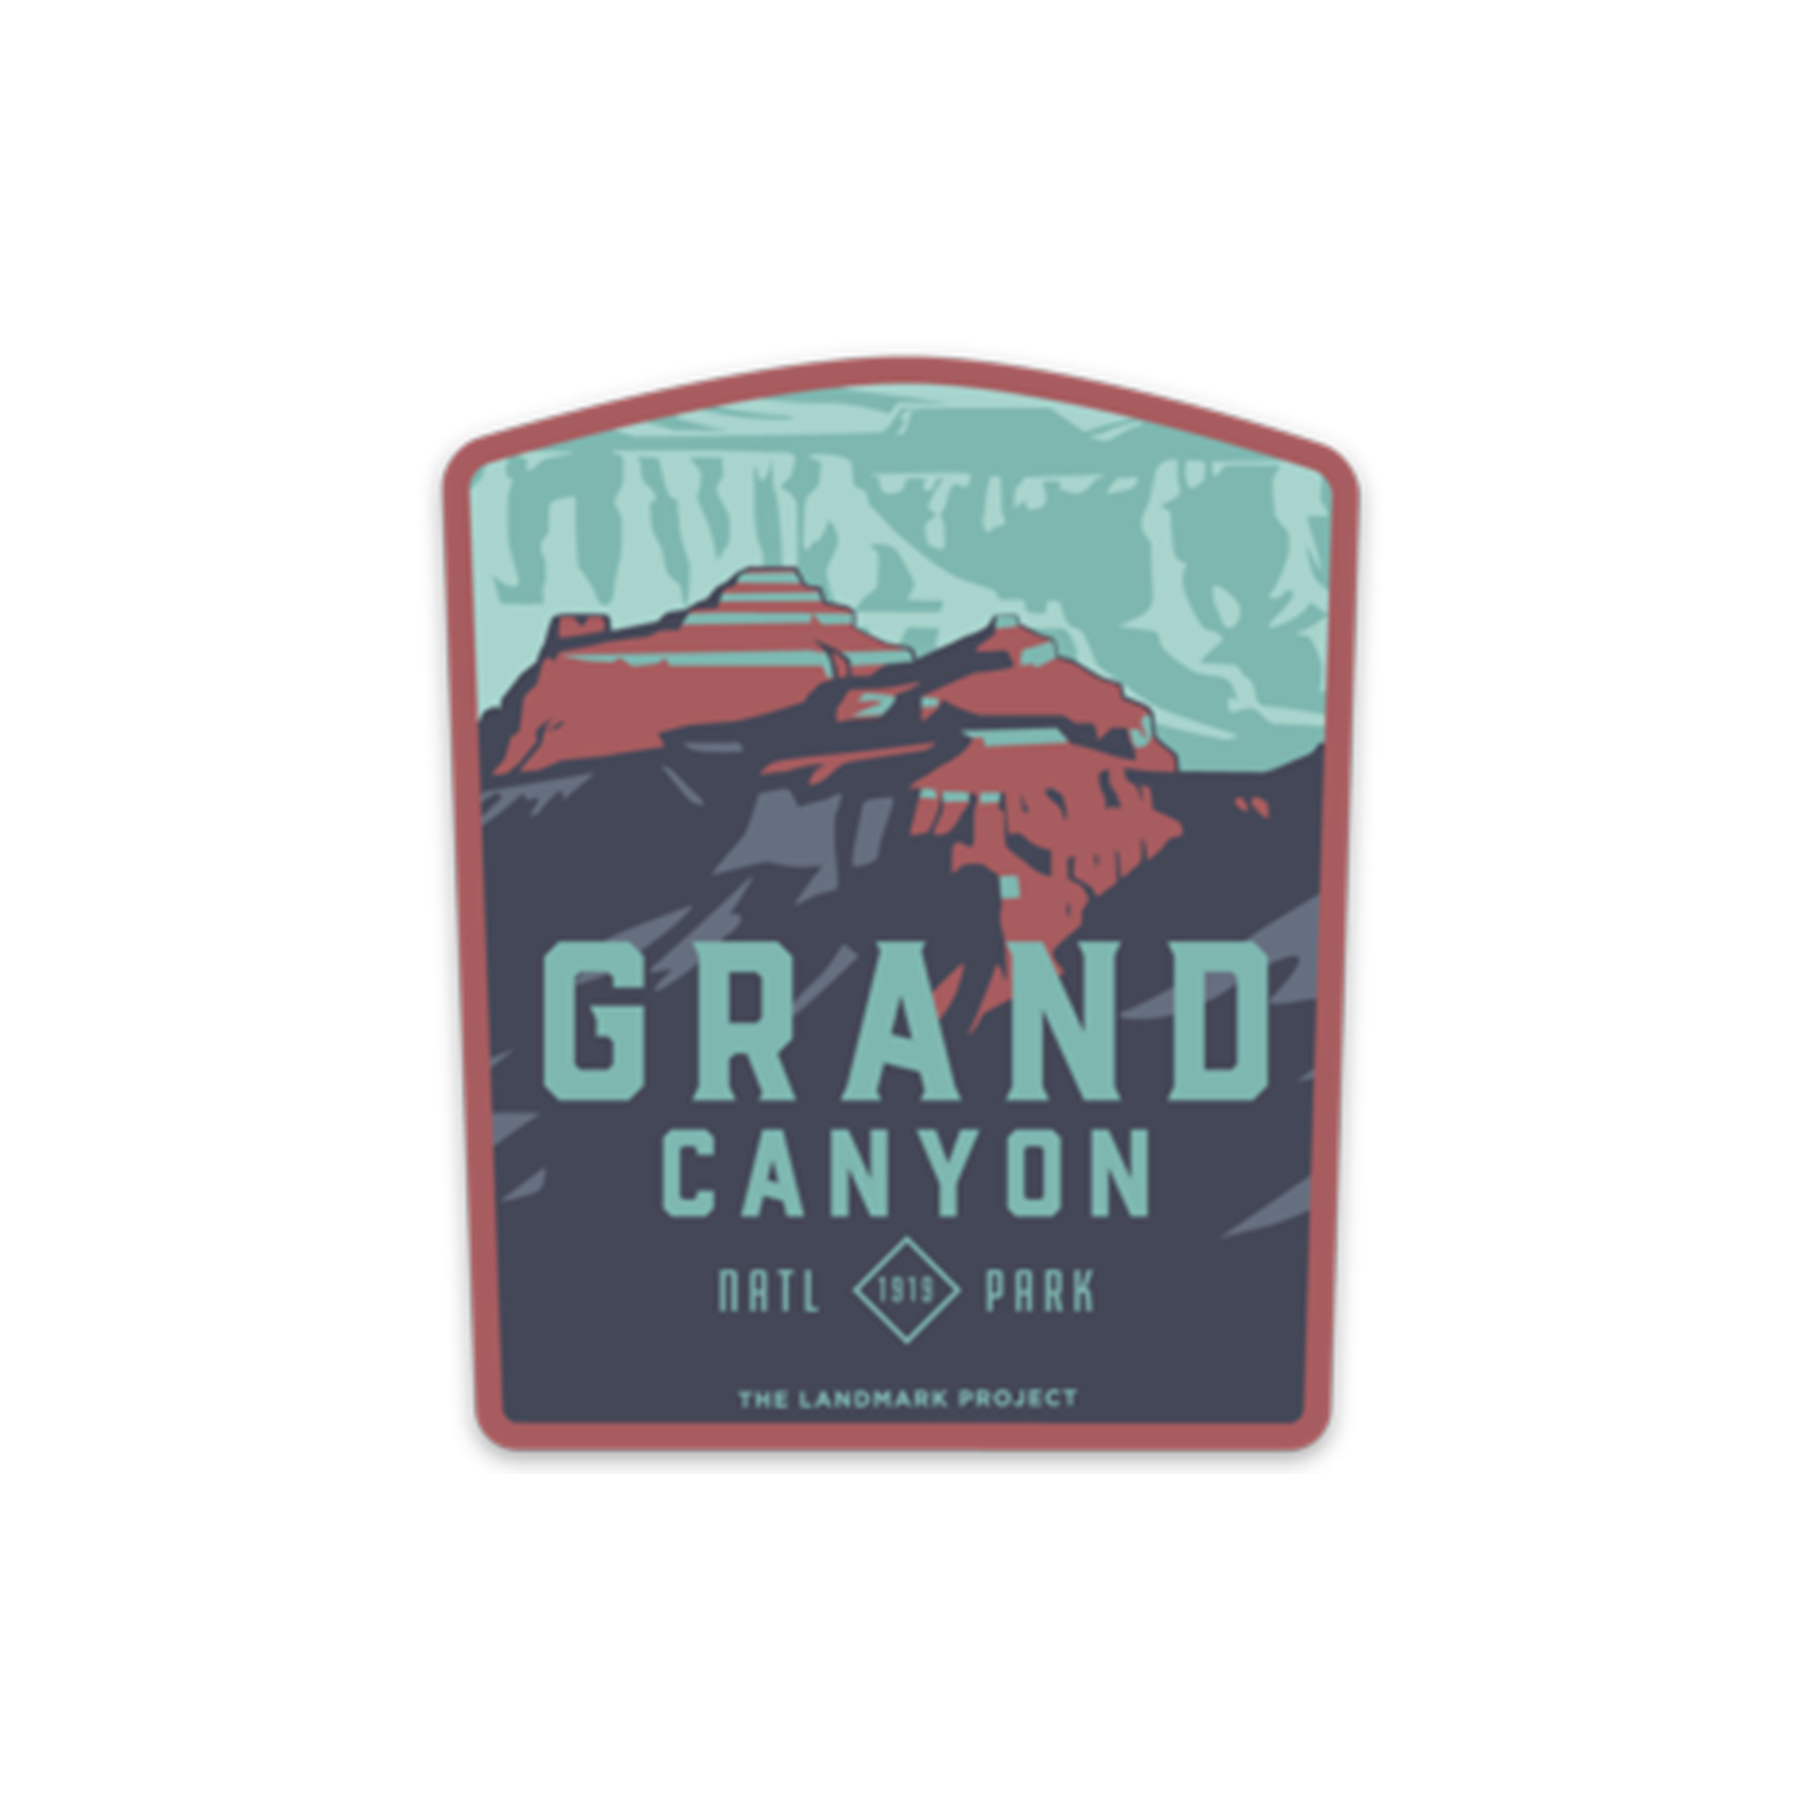 grand-canyon-sticker-2.jpg